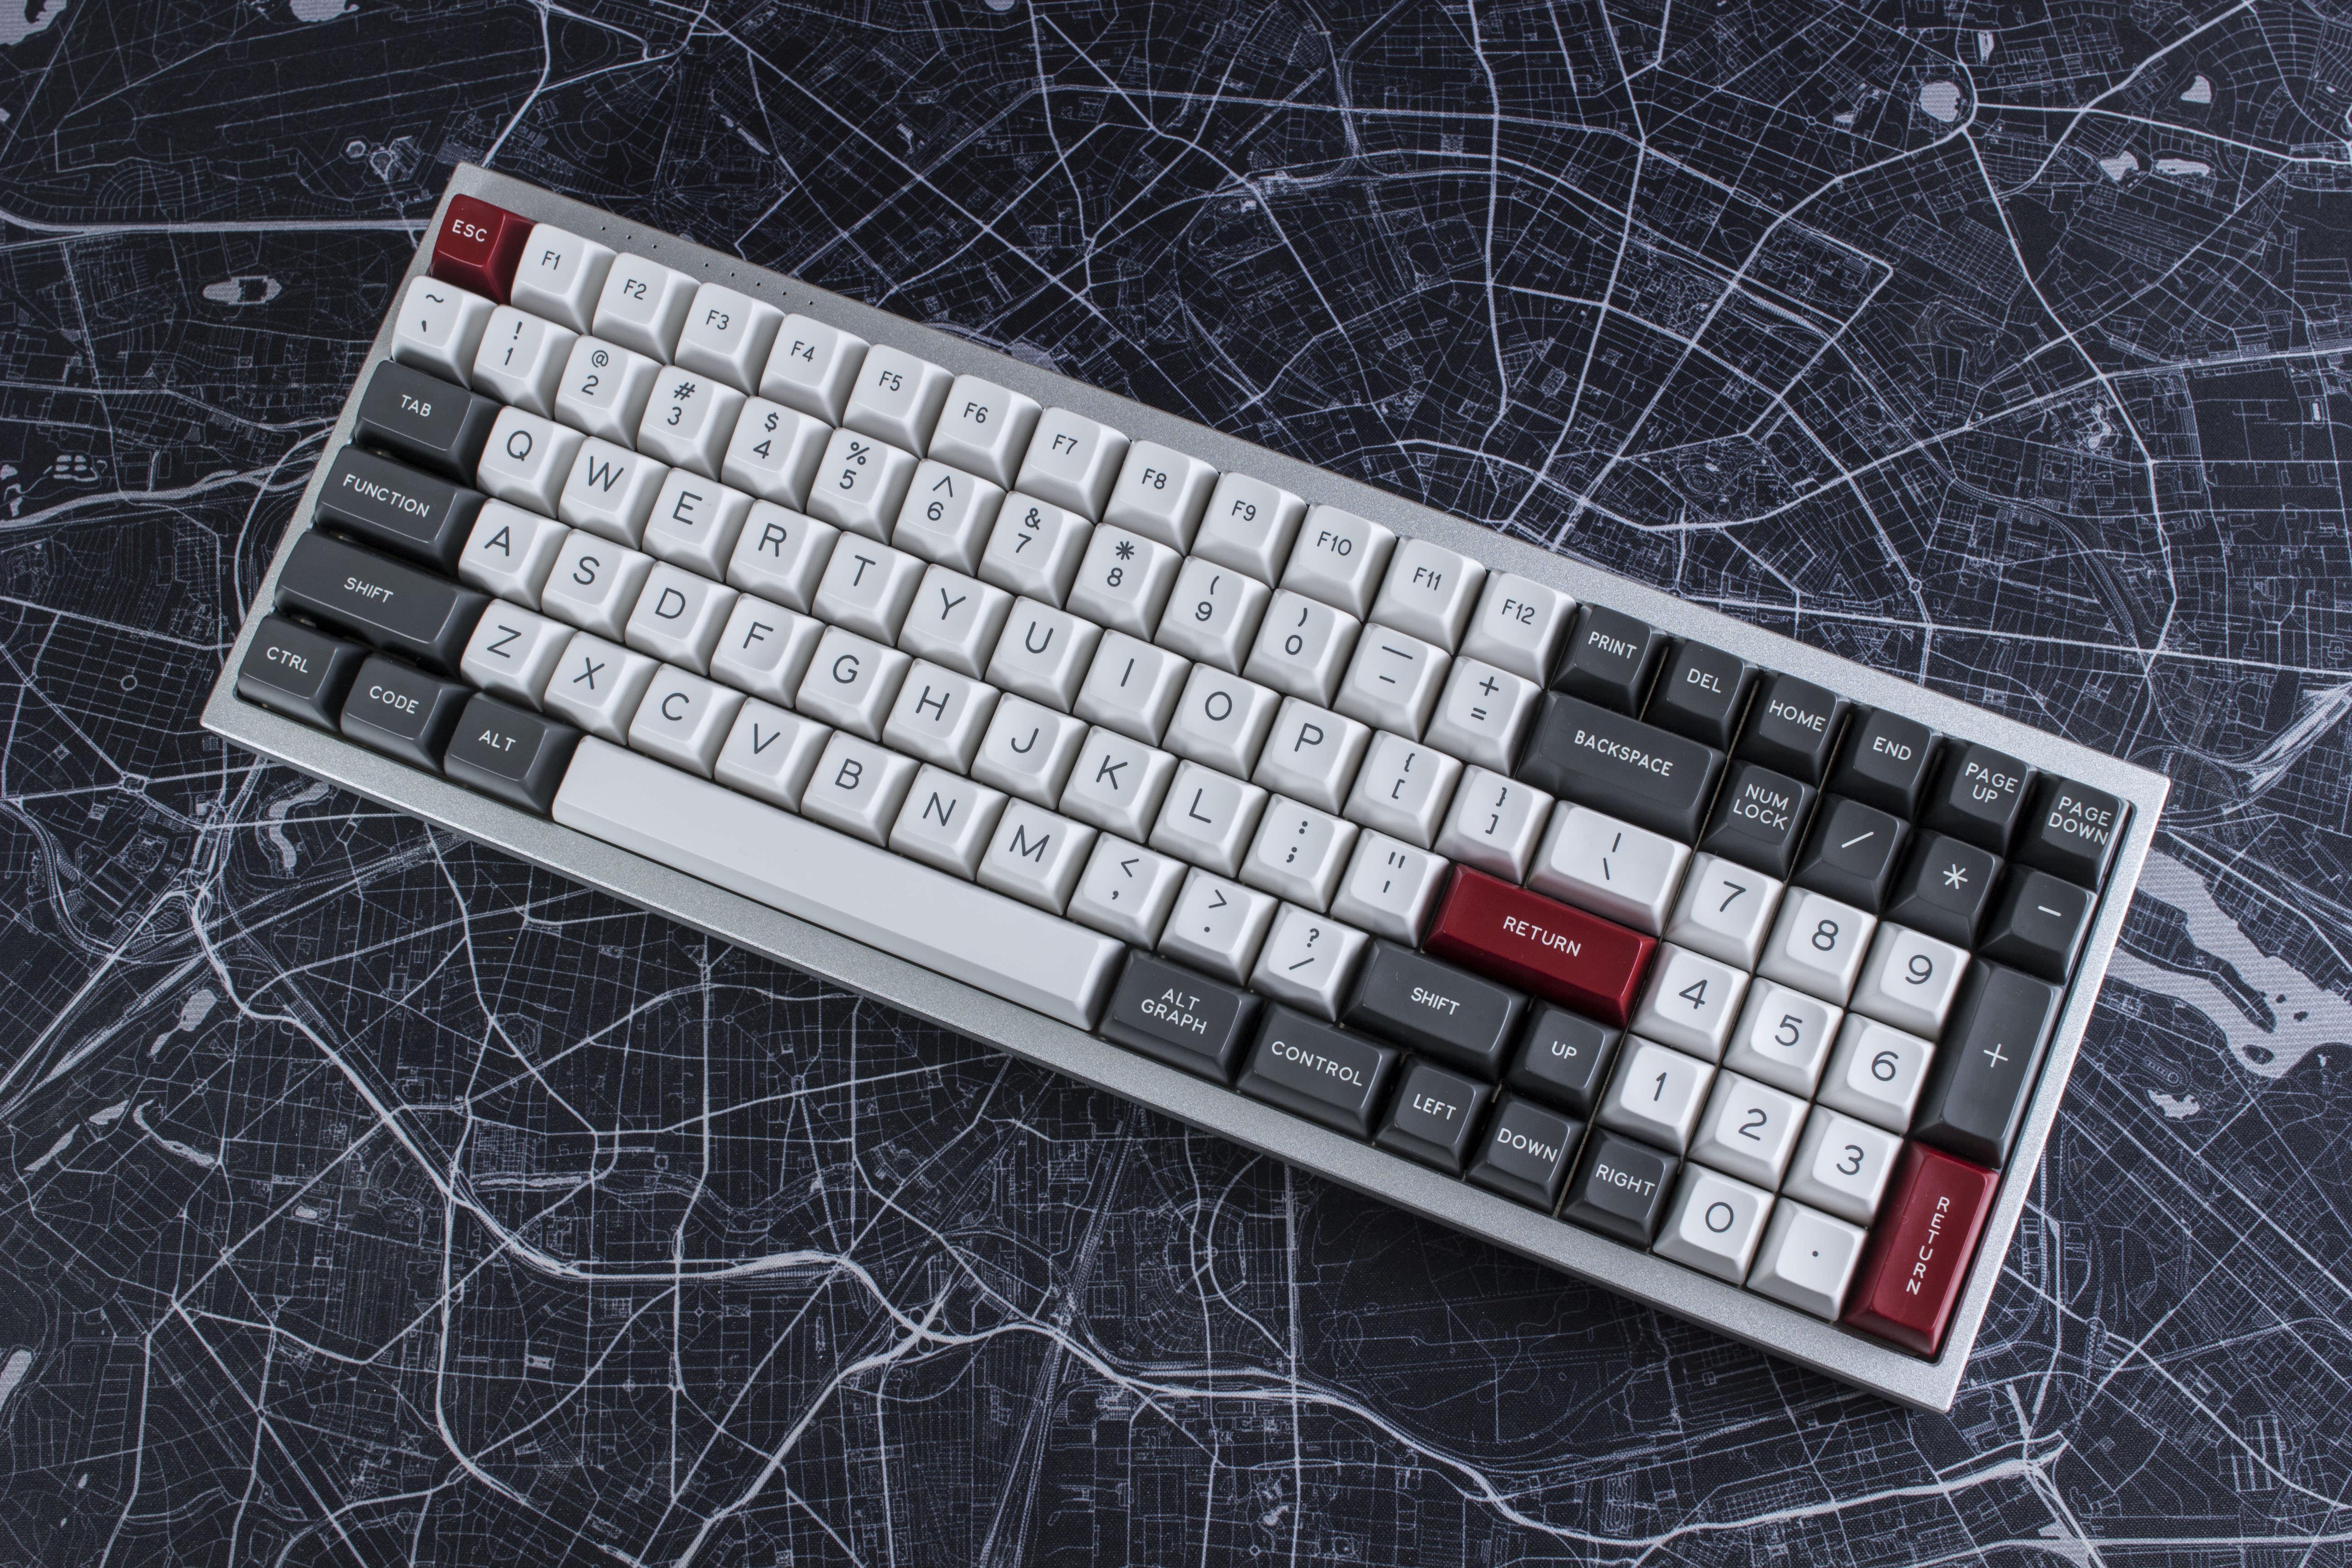 Wallpaper Keyboards Mechanical Keyboard Qwerty 5184x3456 Paranoiddollv2 1874175 Hd Wallpapers Wallhere